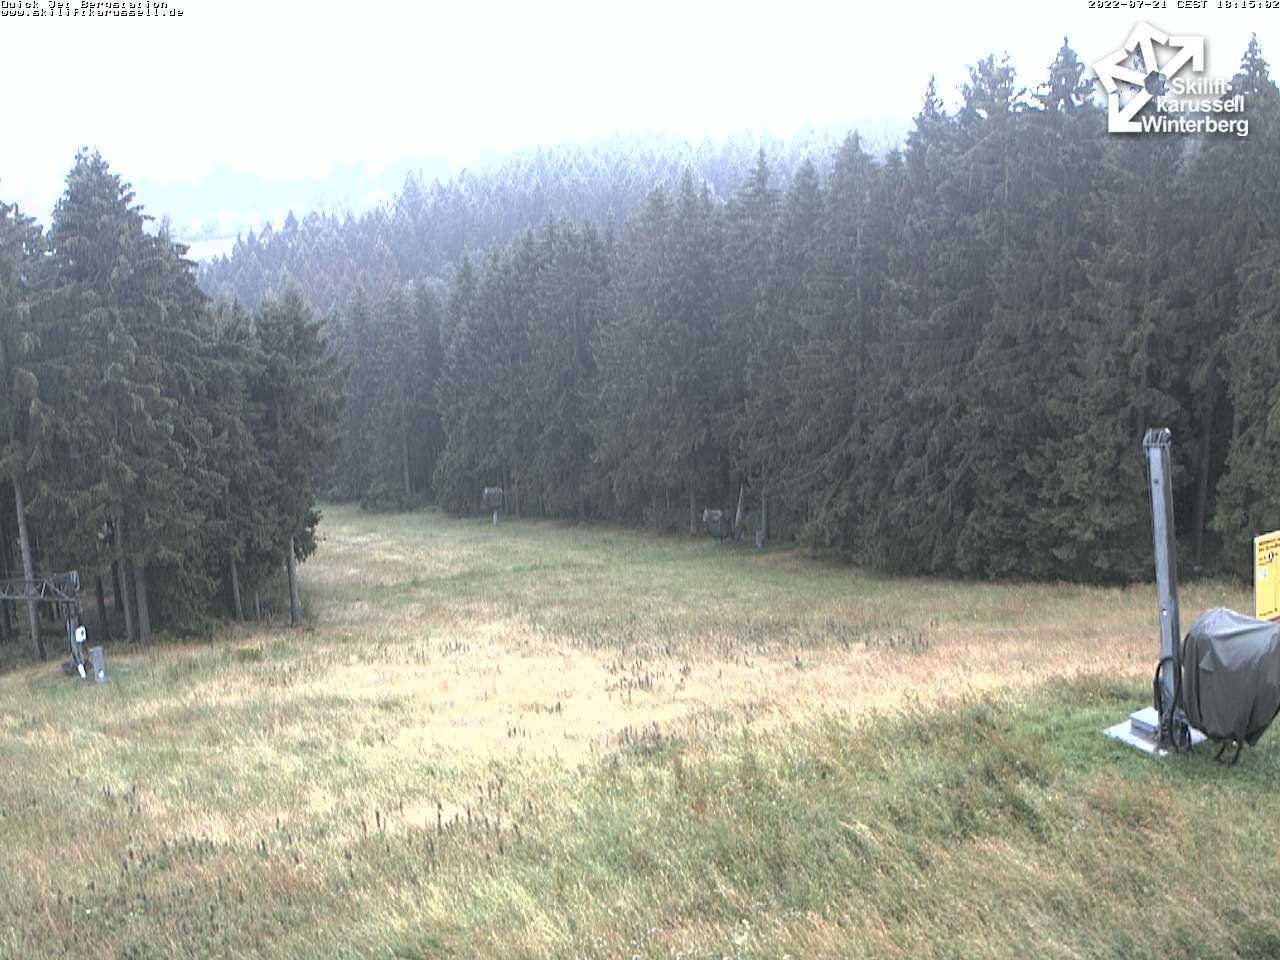 Skiliftkarussell Flutlicht Winterberg Webcam